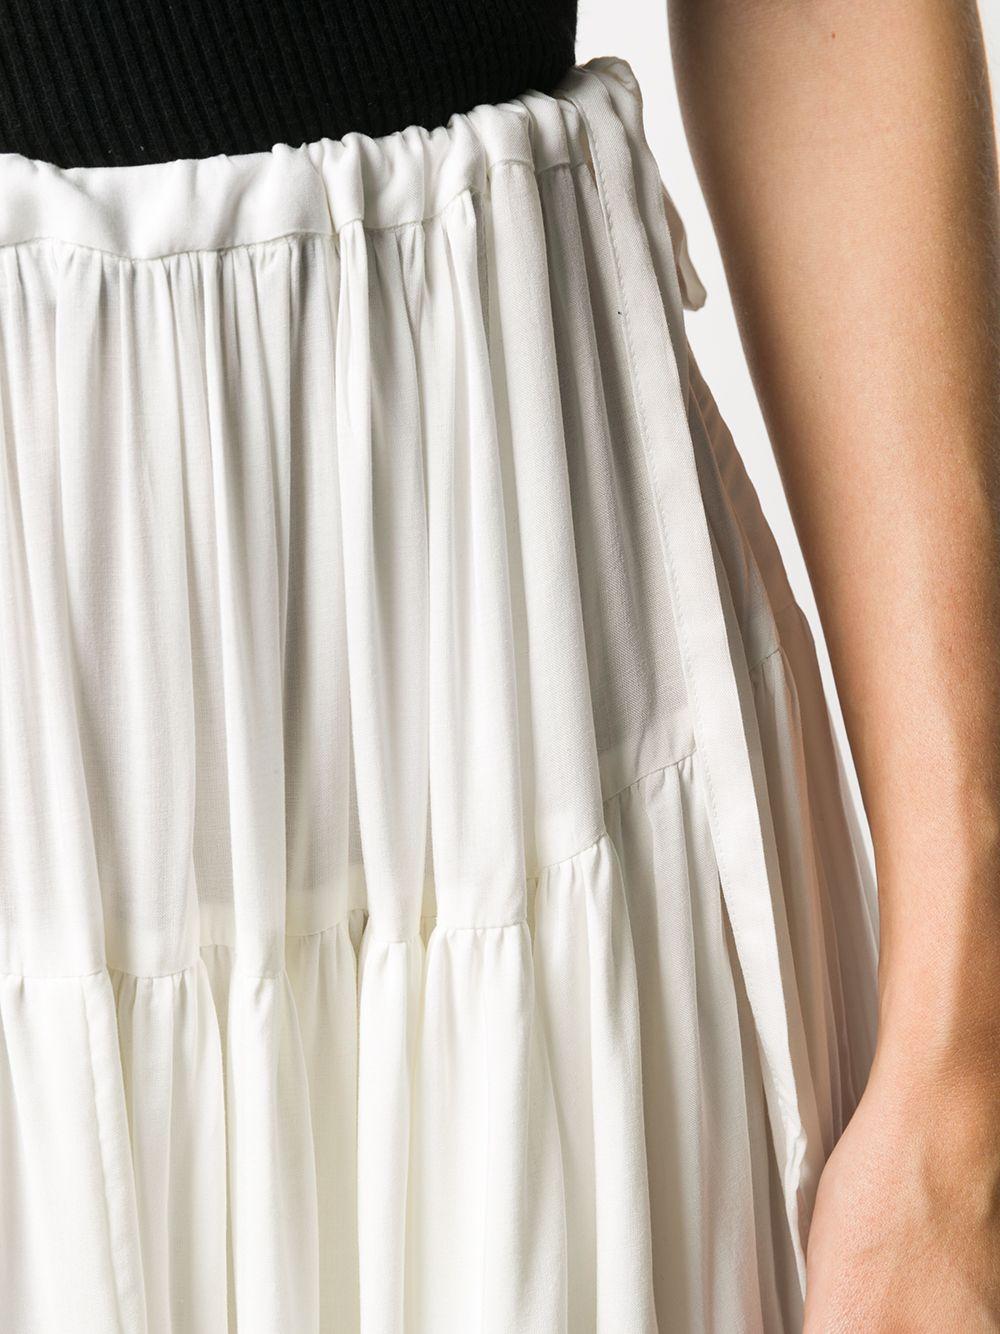 ANN DEMEULEMEESTER | Skirt | 2002-1752-119002